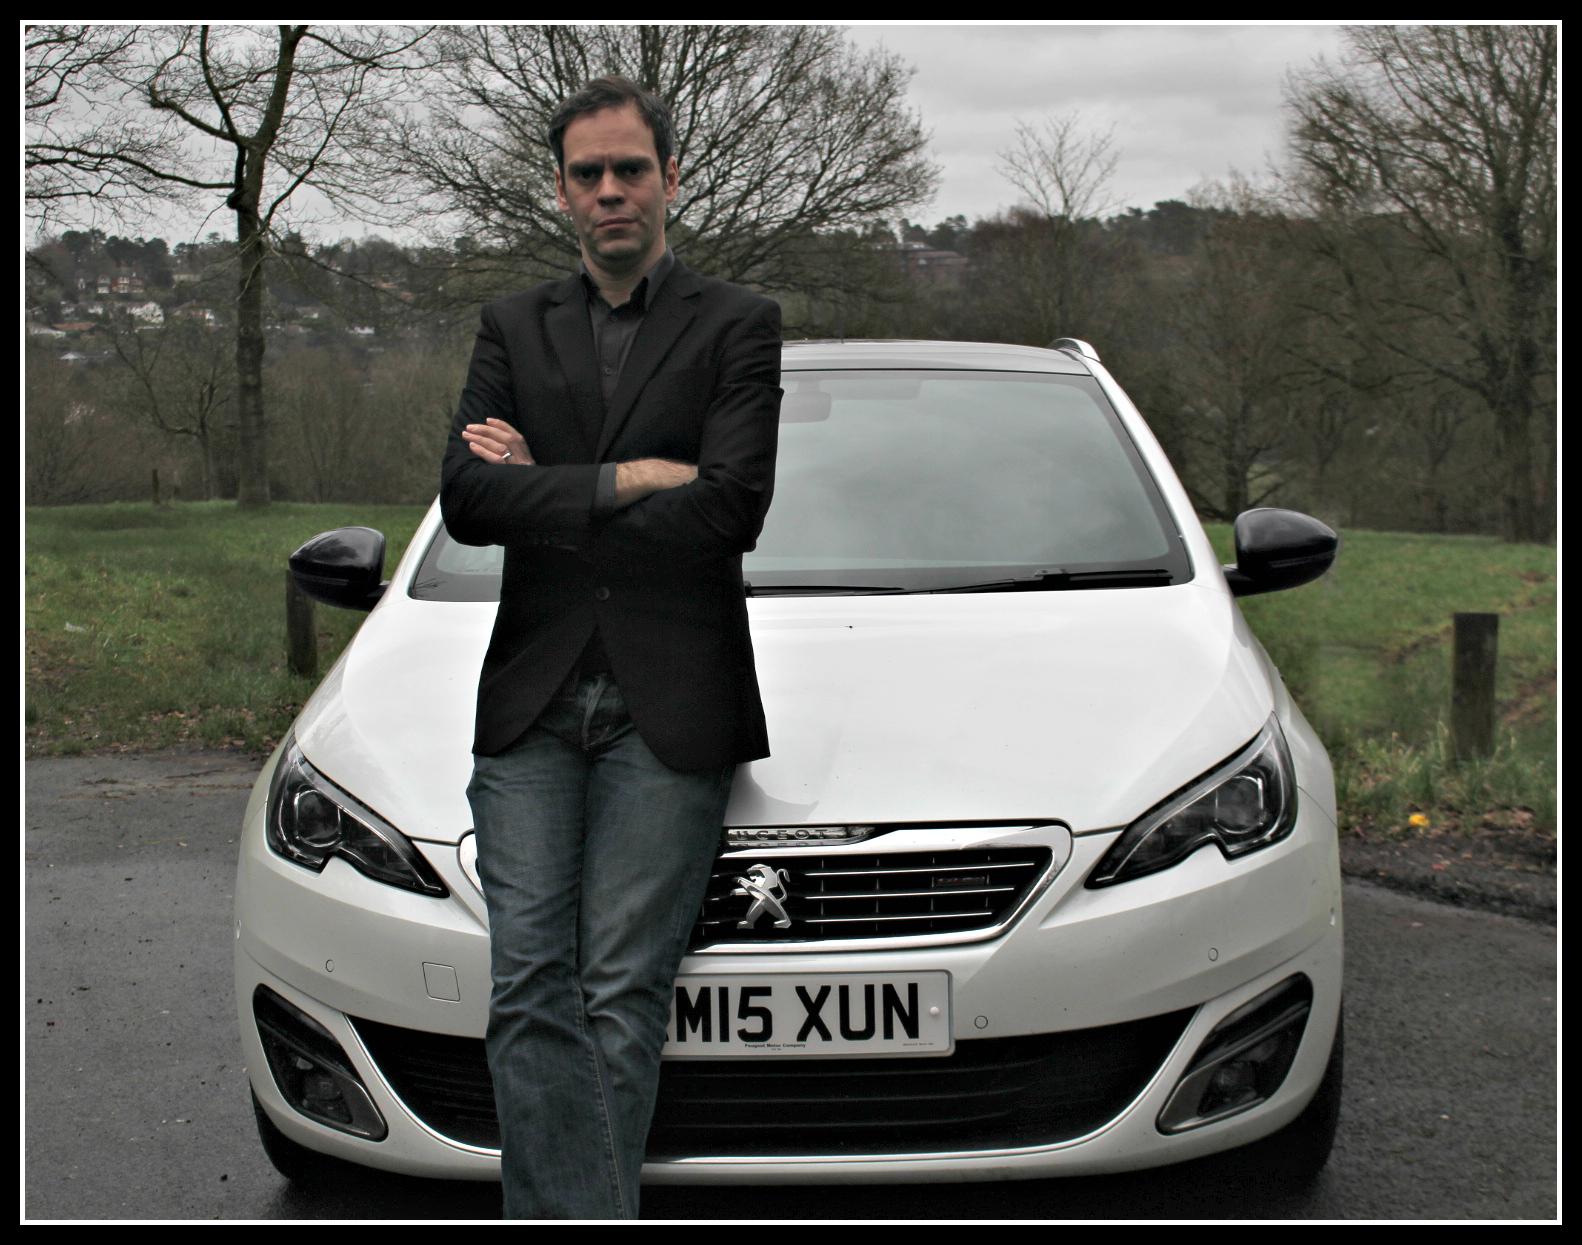 Peugeot, Peugeot 308, family car, review, reviews